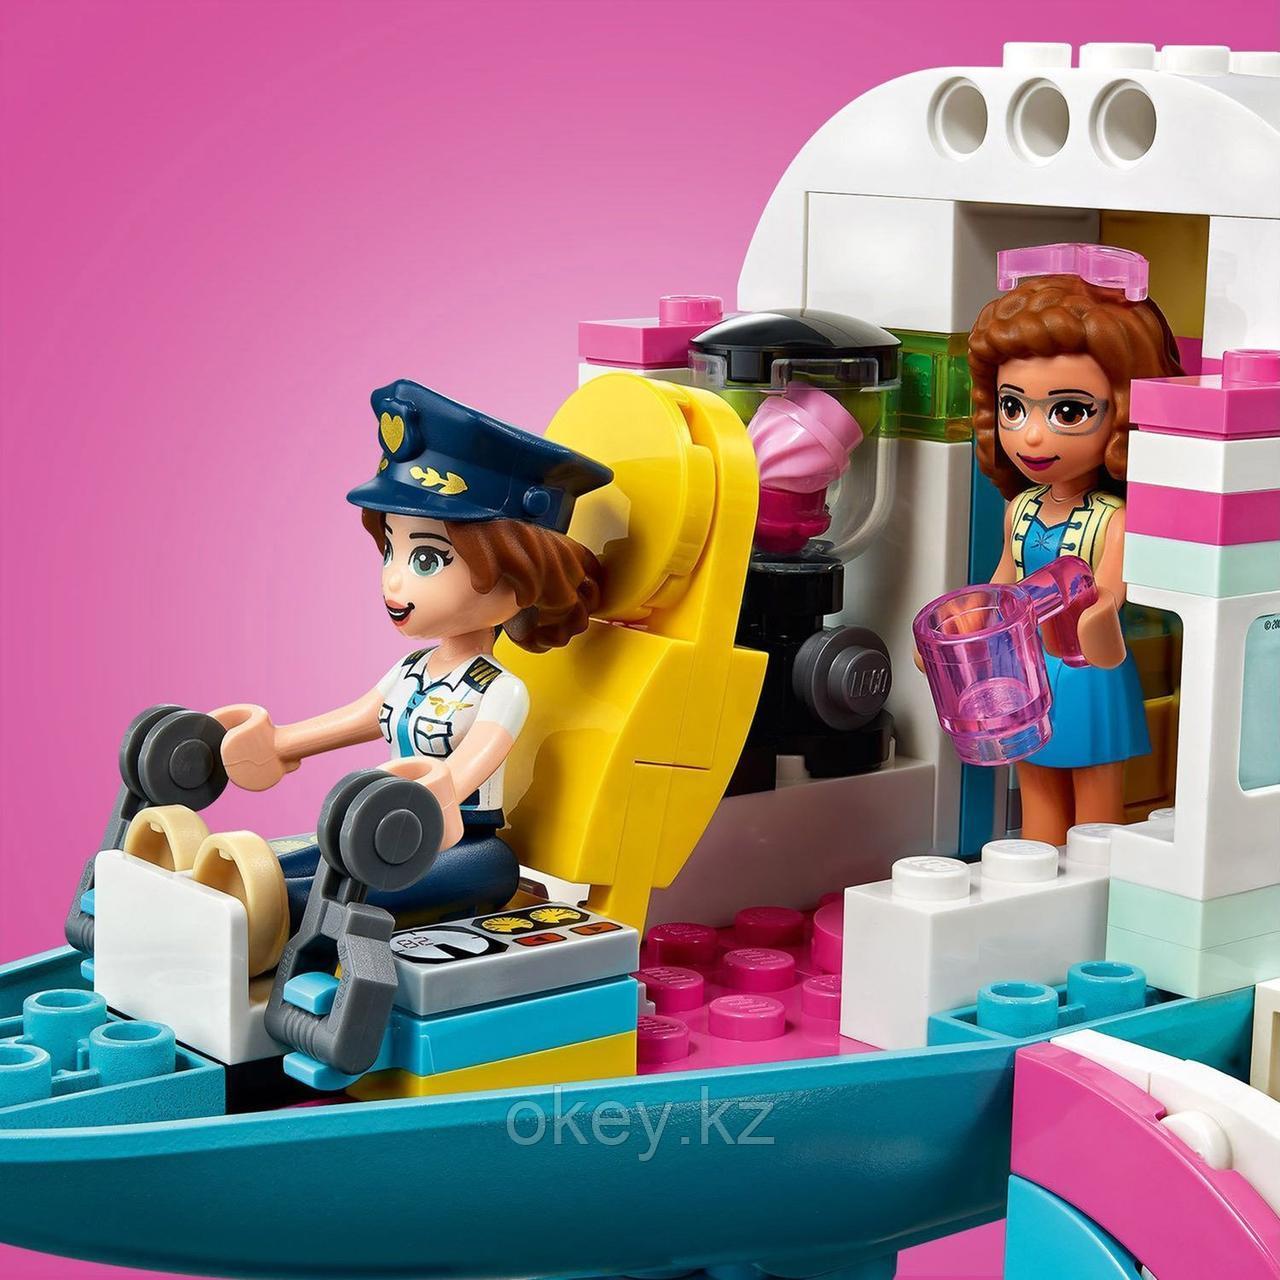 LEGO Friends: Самолёт в Хартлейк Сити 41429 - фото 10